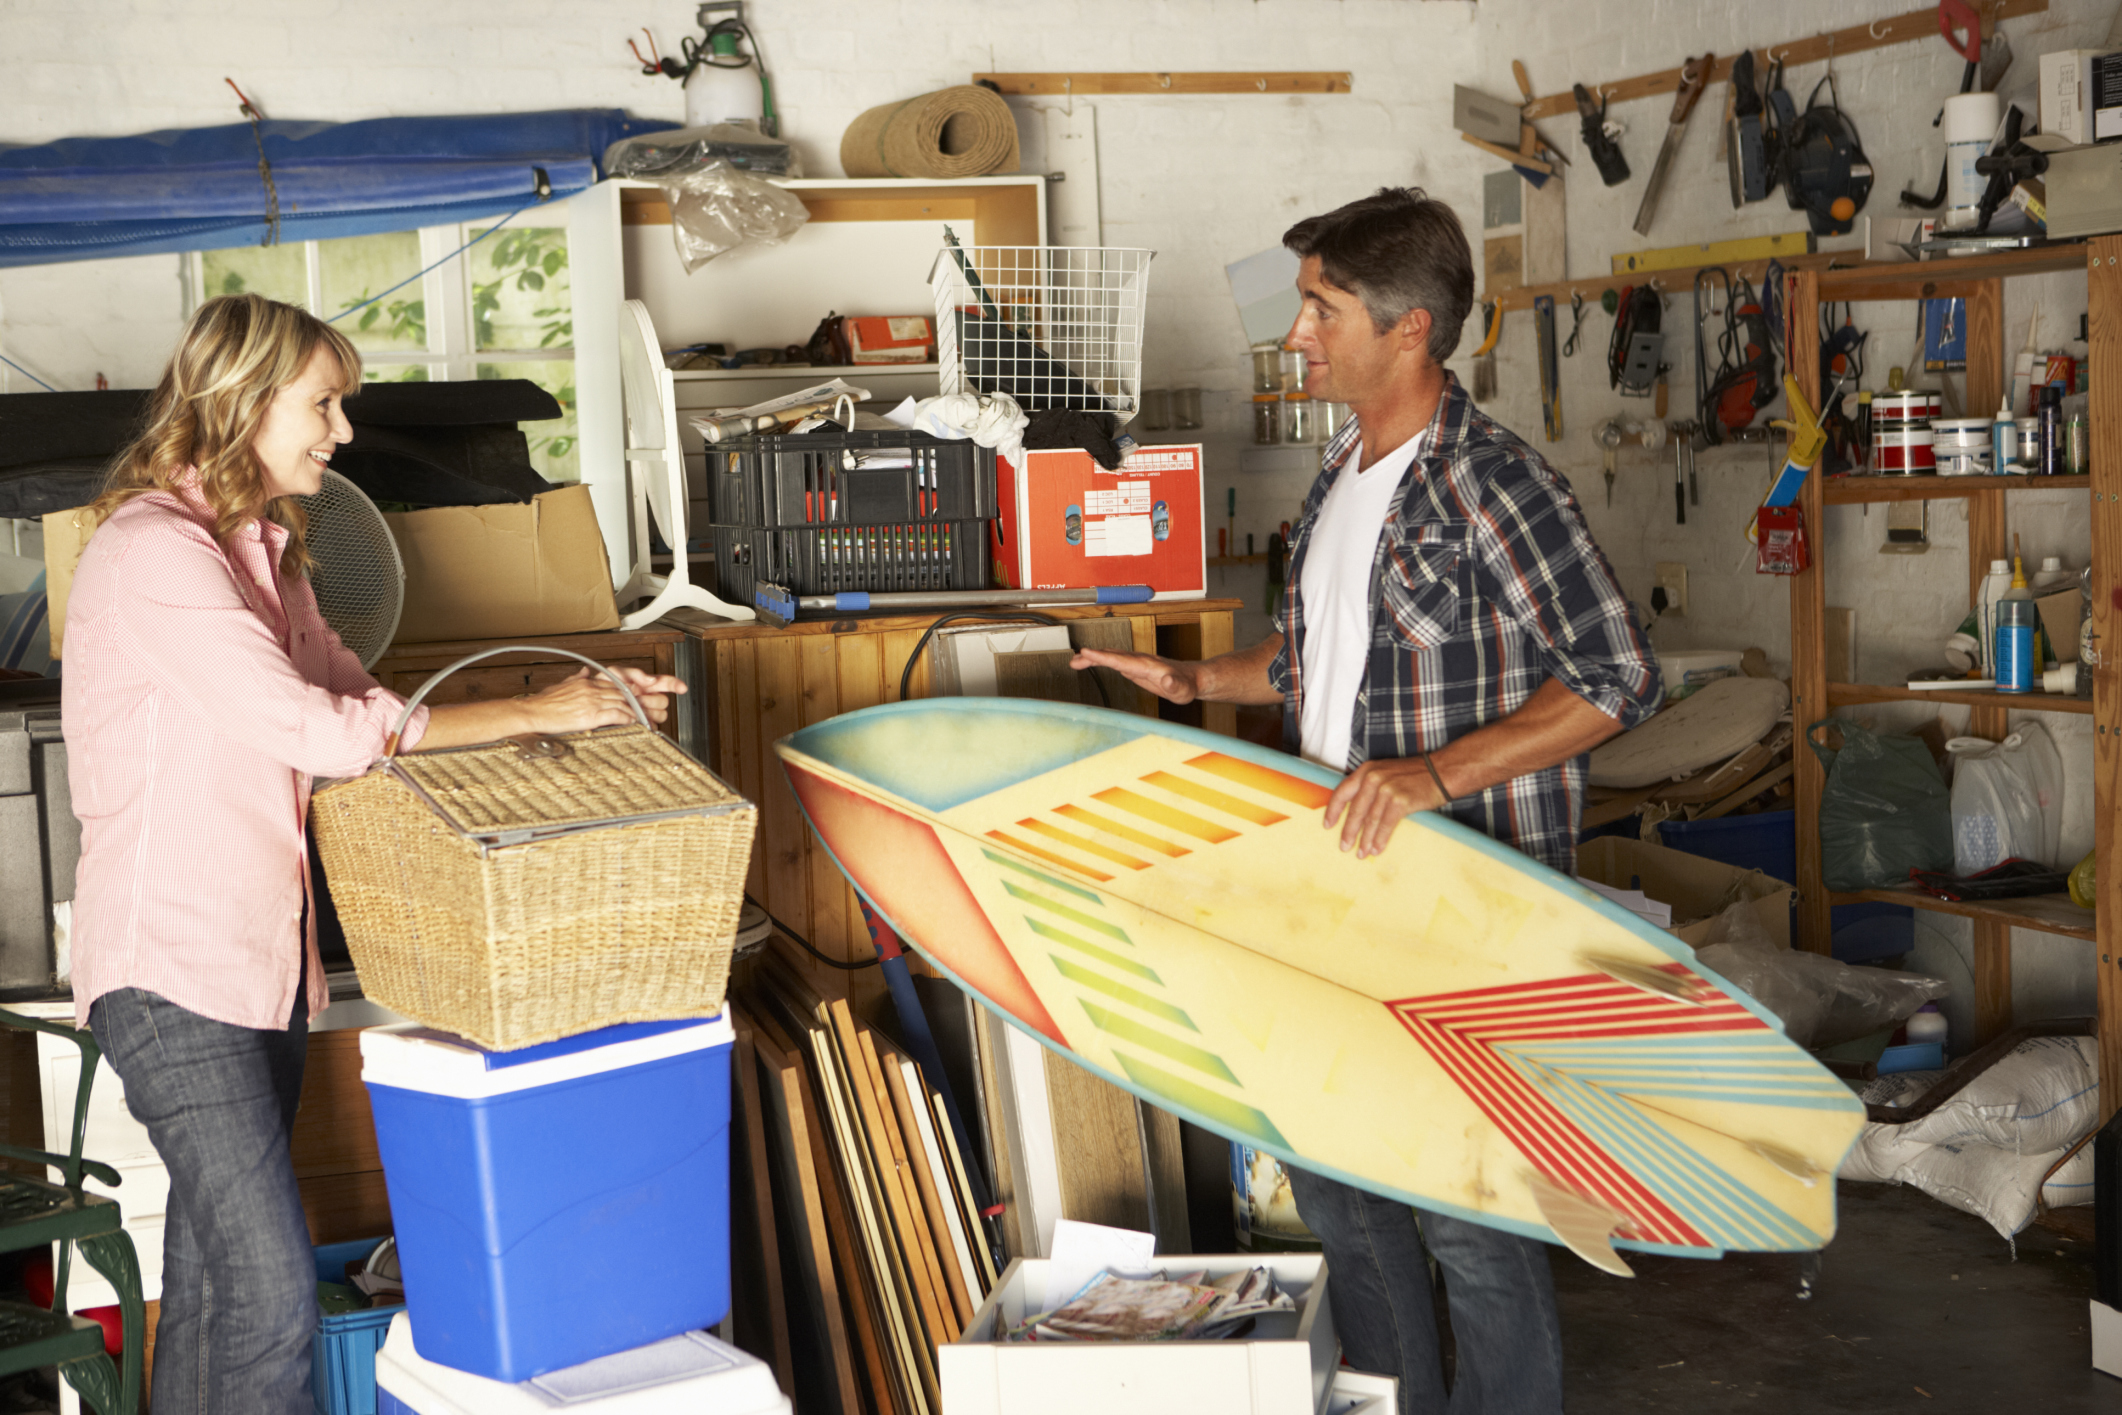 4 Steps to an Organized Garage - American Profile on Organized Garage  id=13798